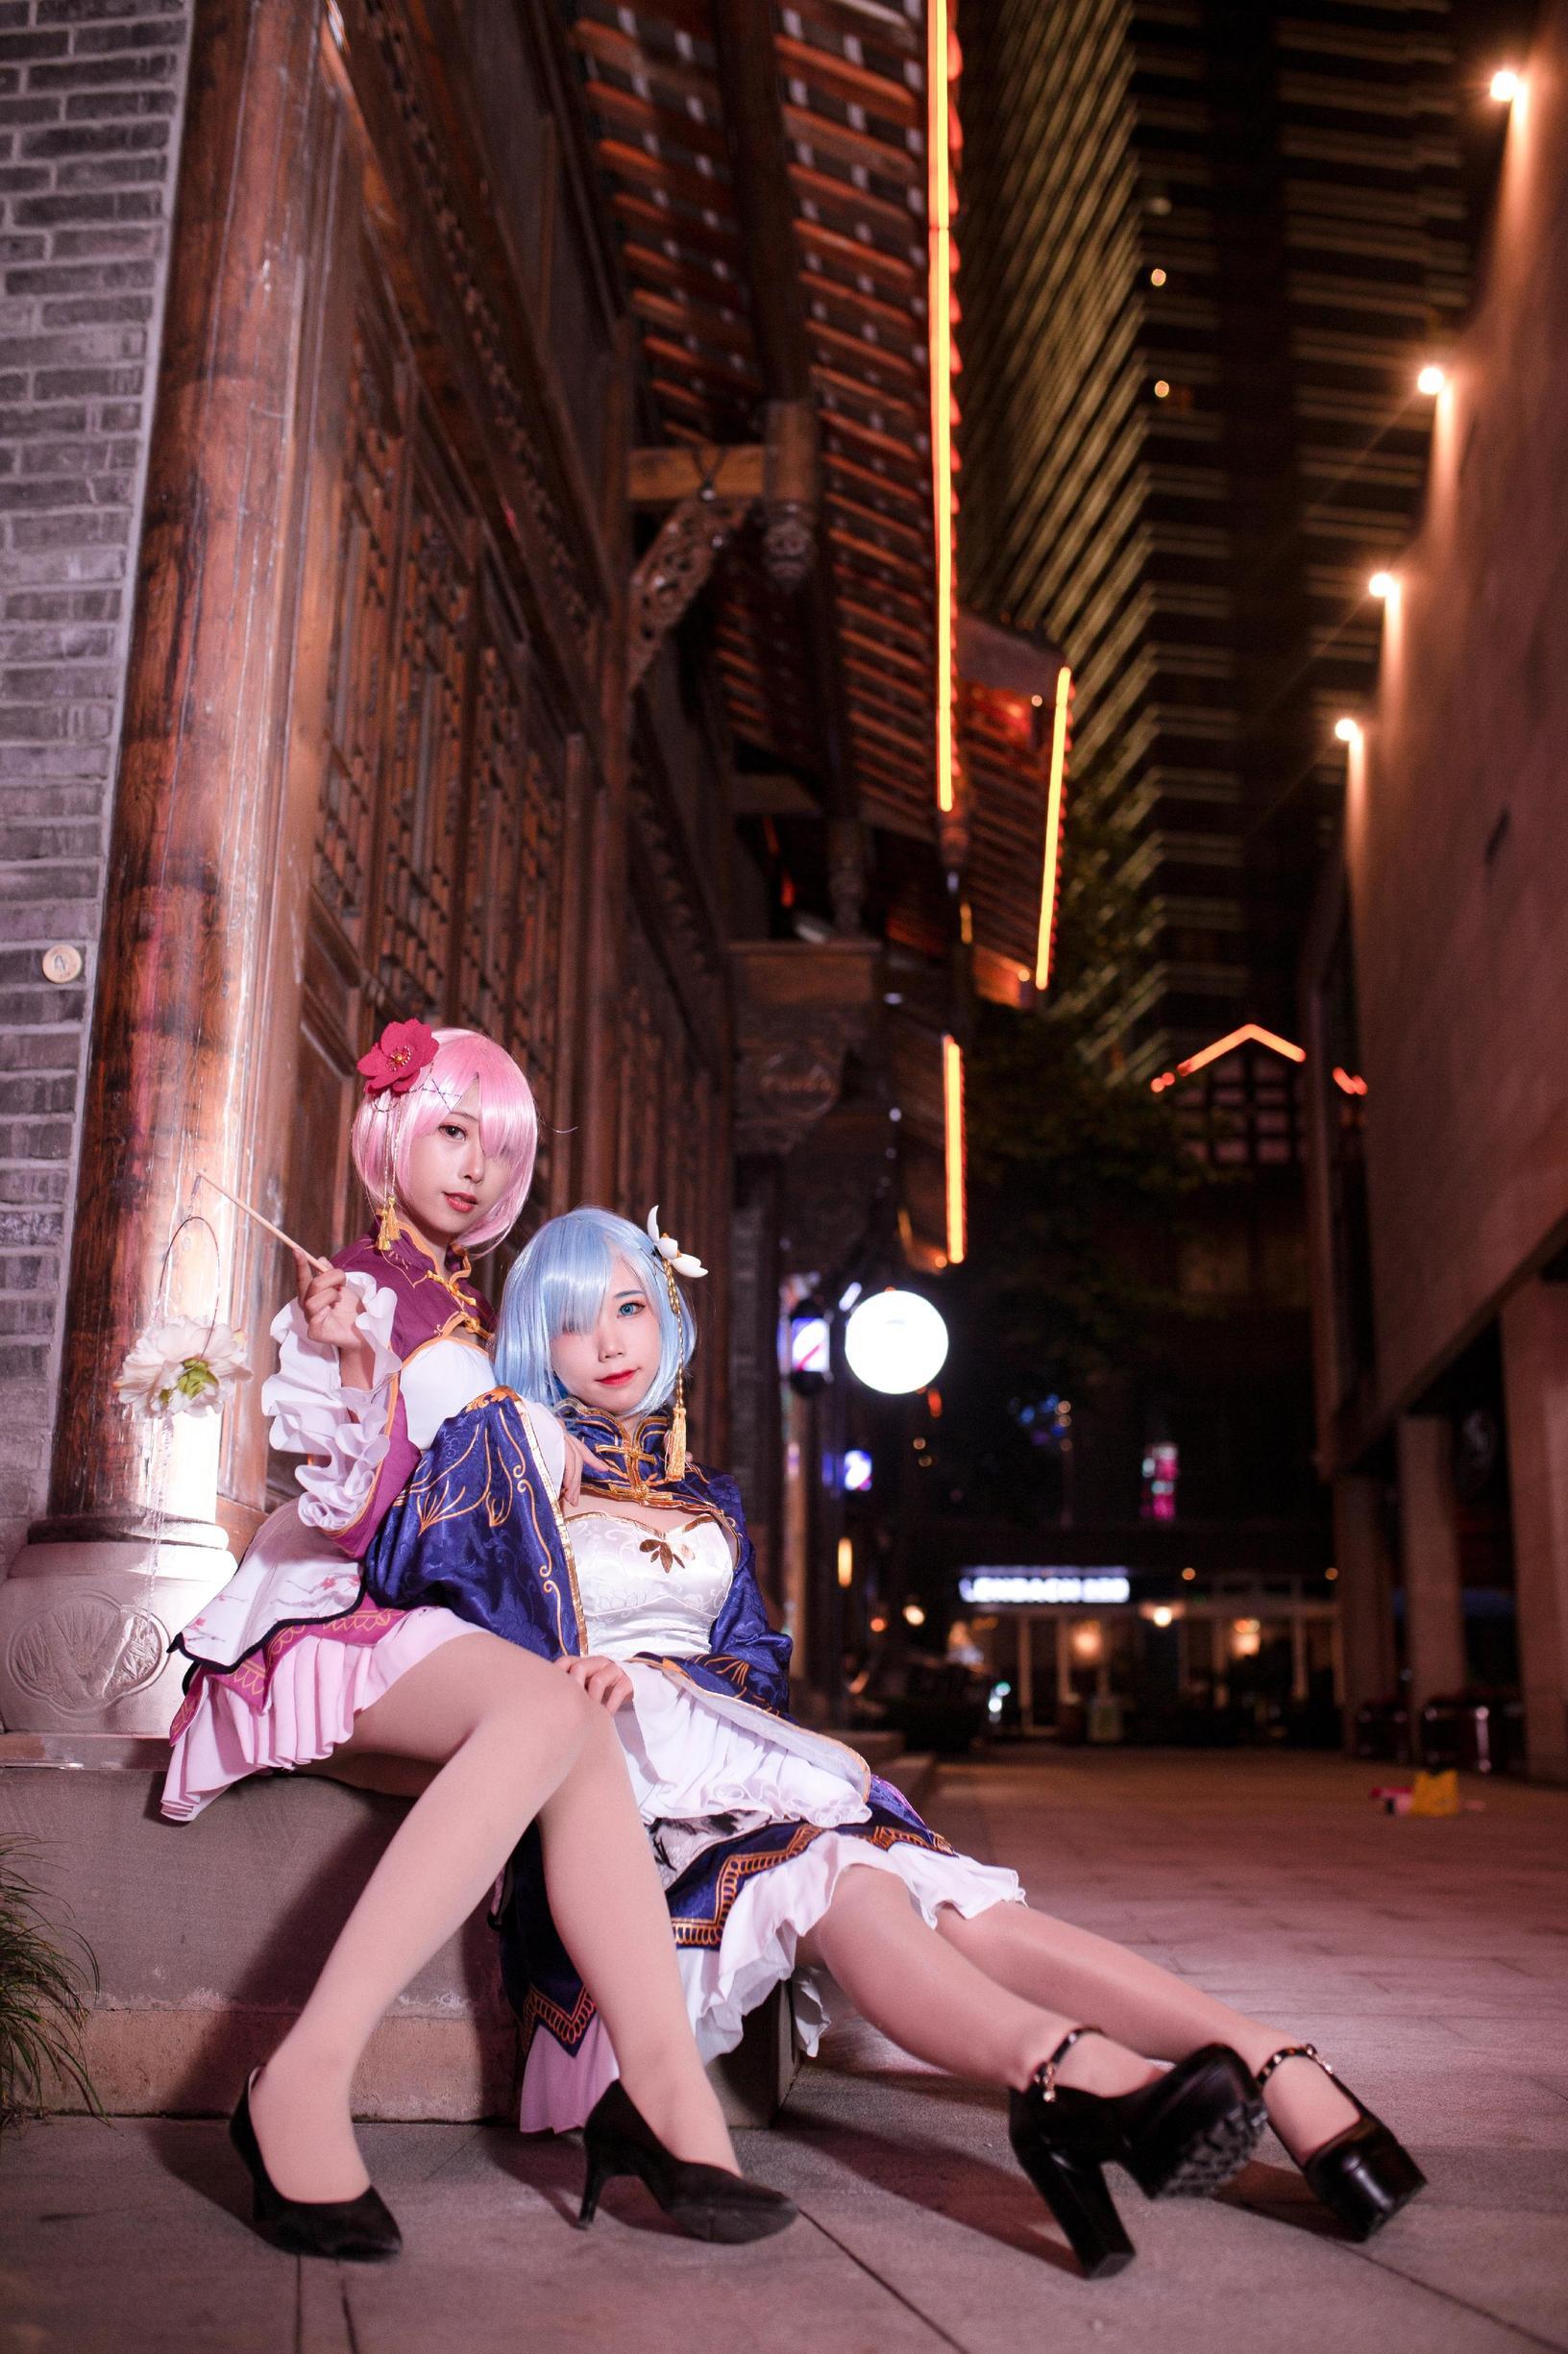 《RE:从零开始的异世界生活》正片cosplay【CN:柒八氿】-第1张